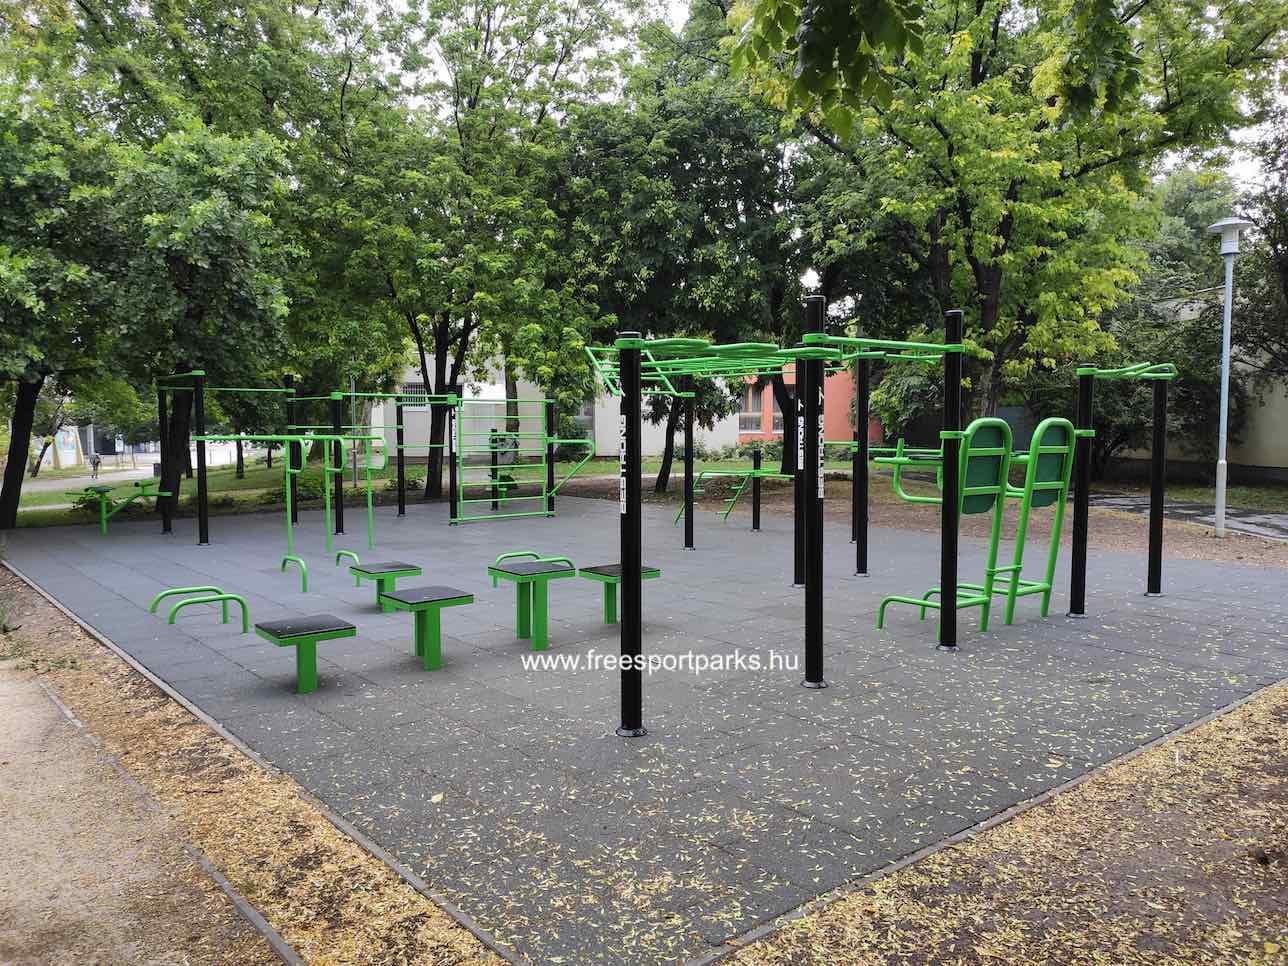 Holdudvar park - Óbudai kondipark (Street Workout Park) - Free Sport Parks térkép